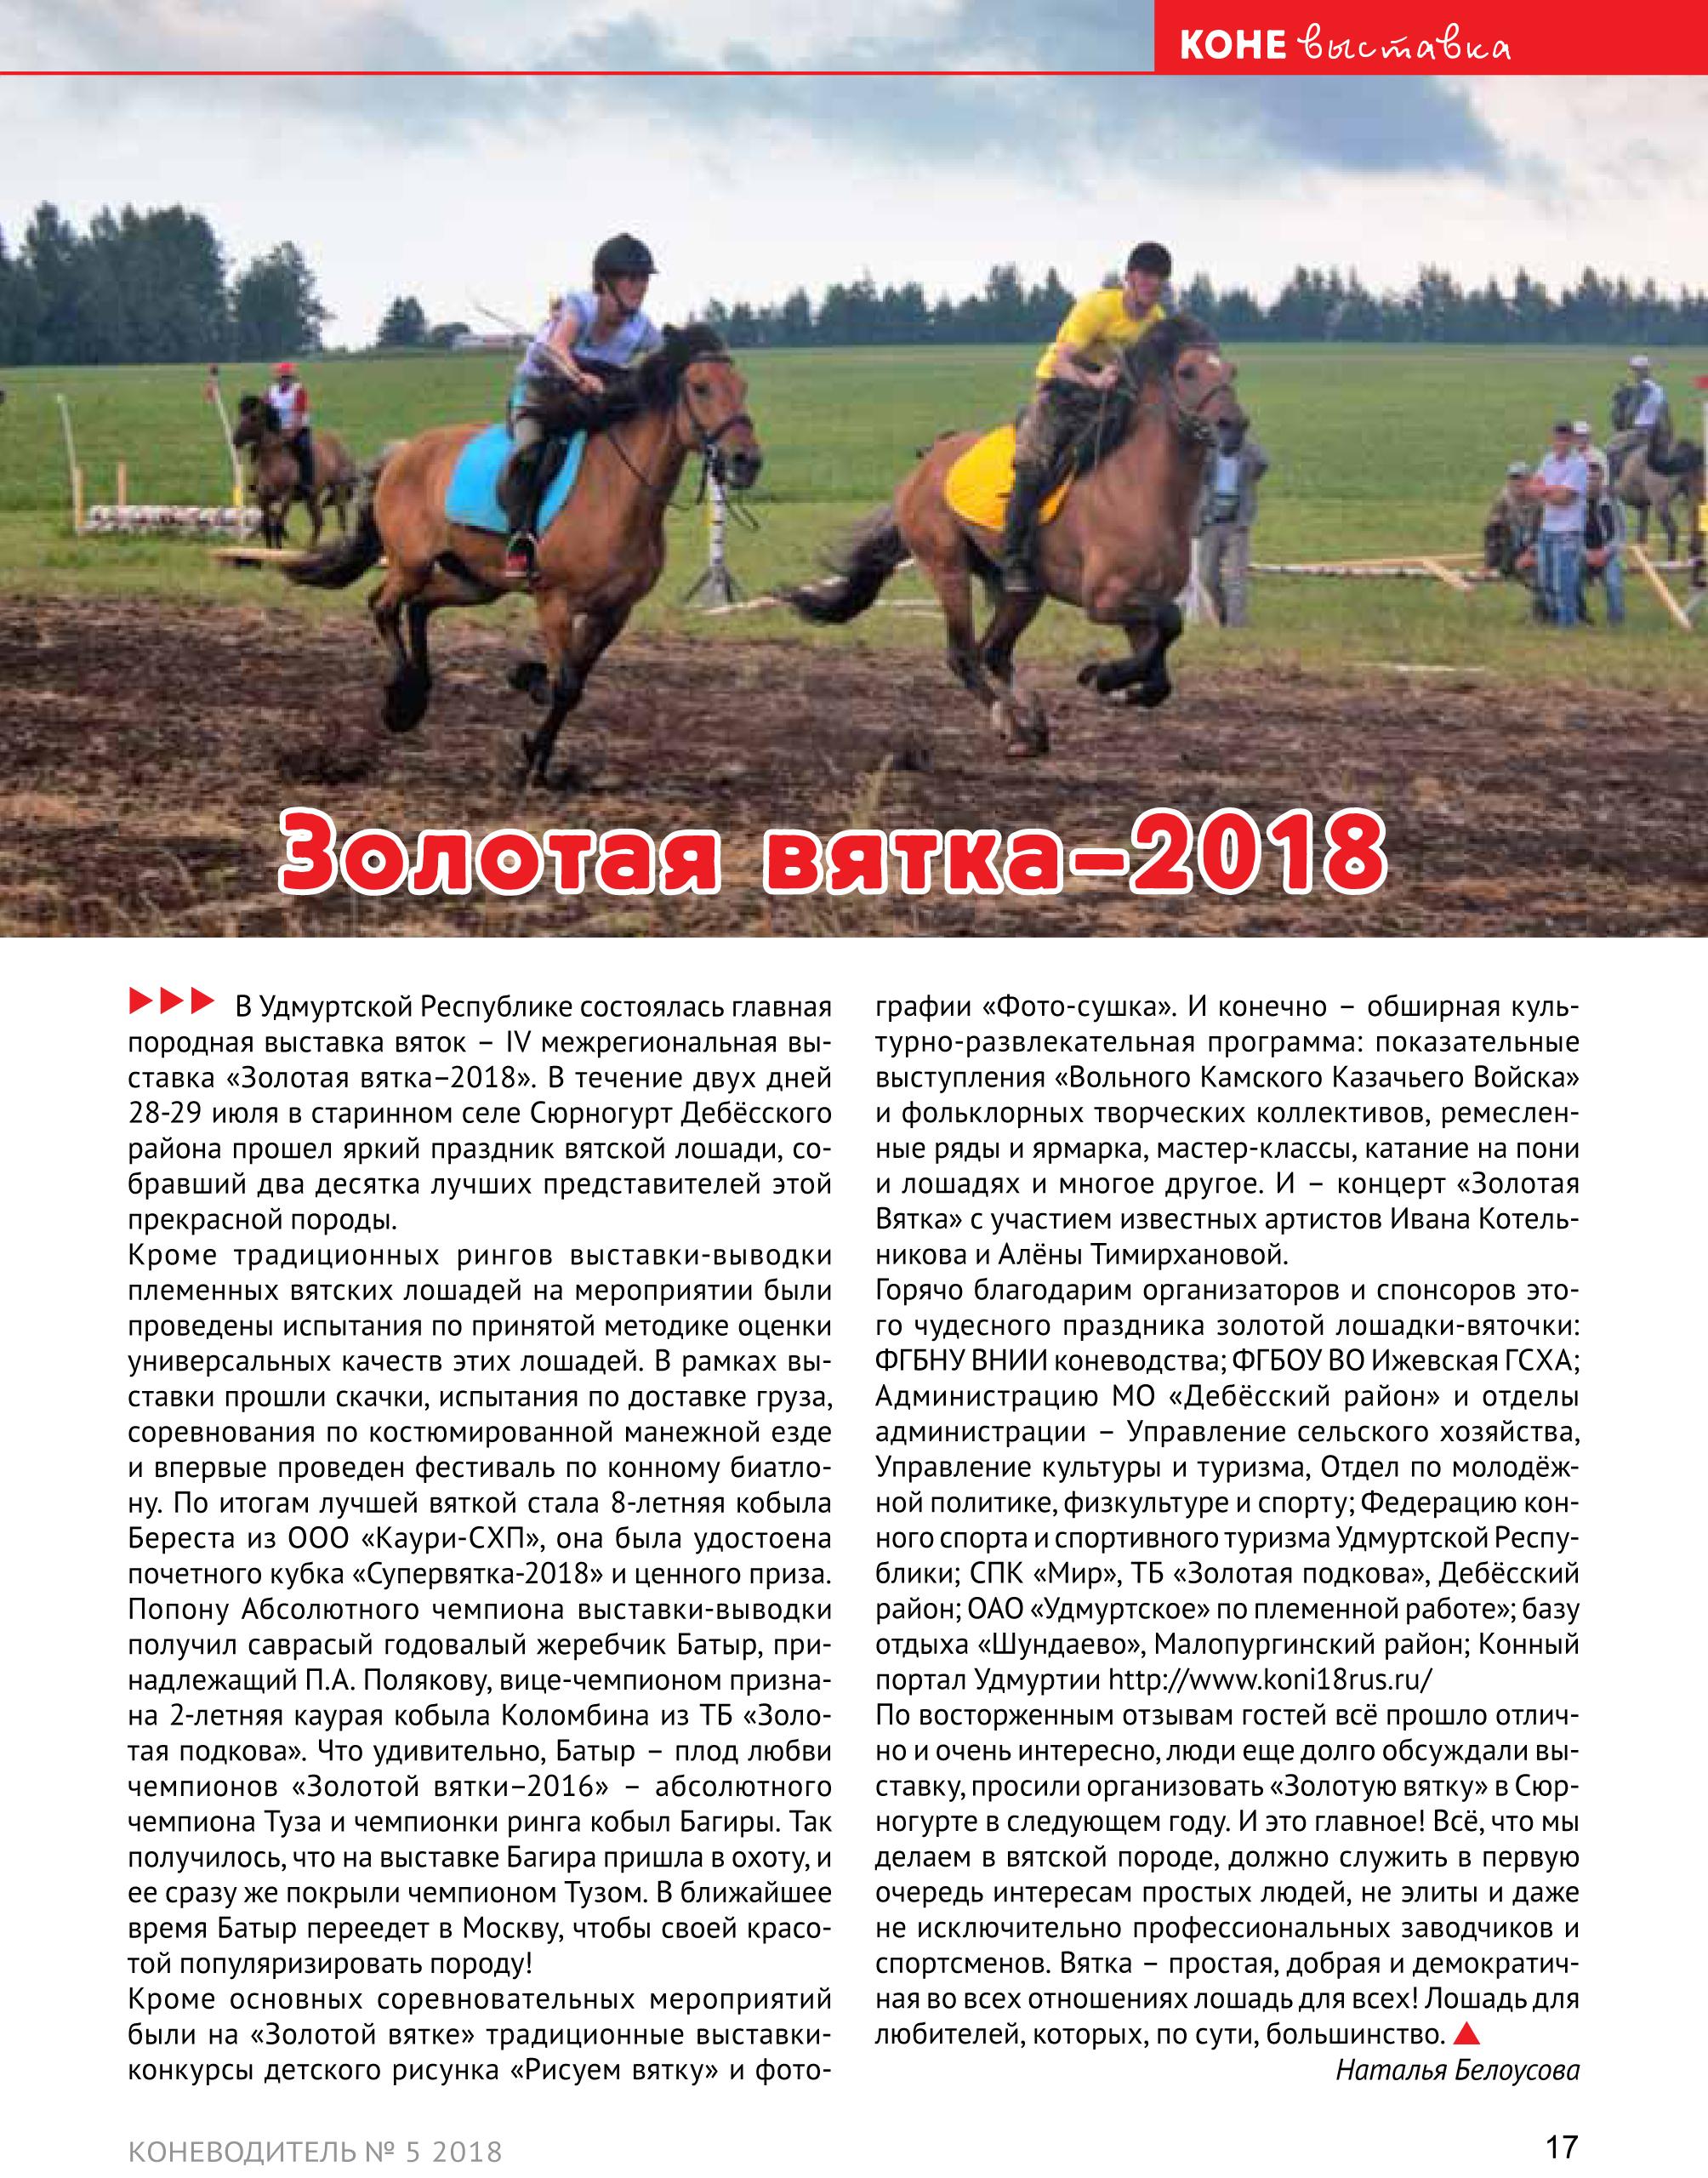 Book 5 2018 ДЛЯ САЙТА-17